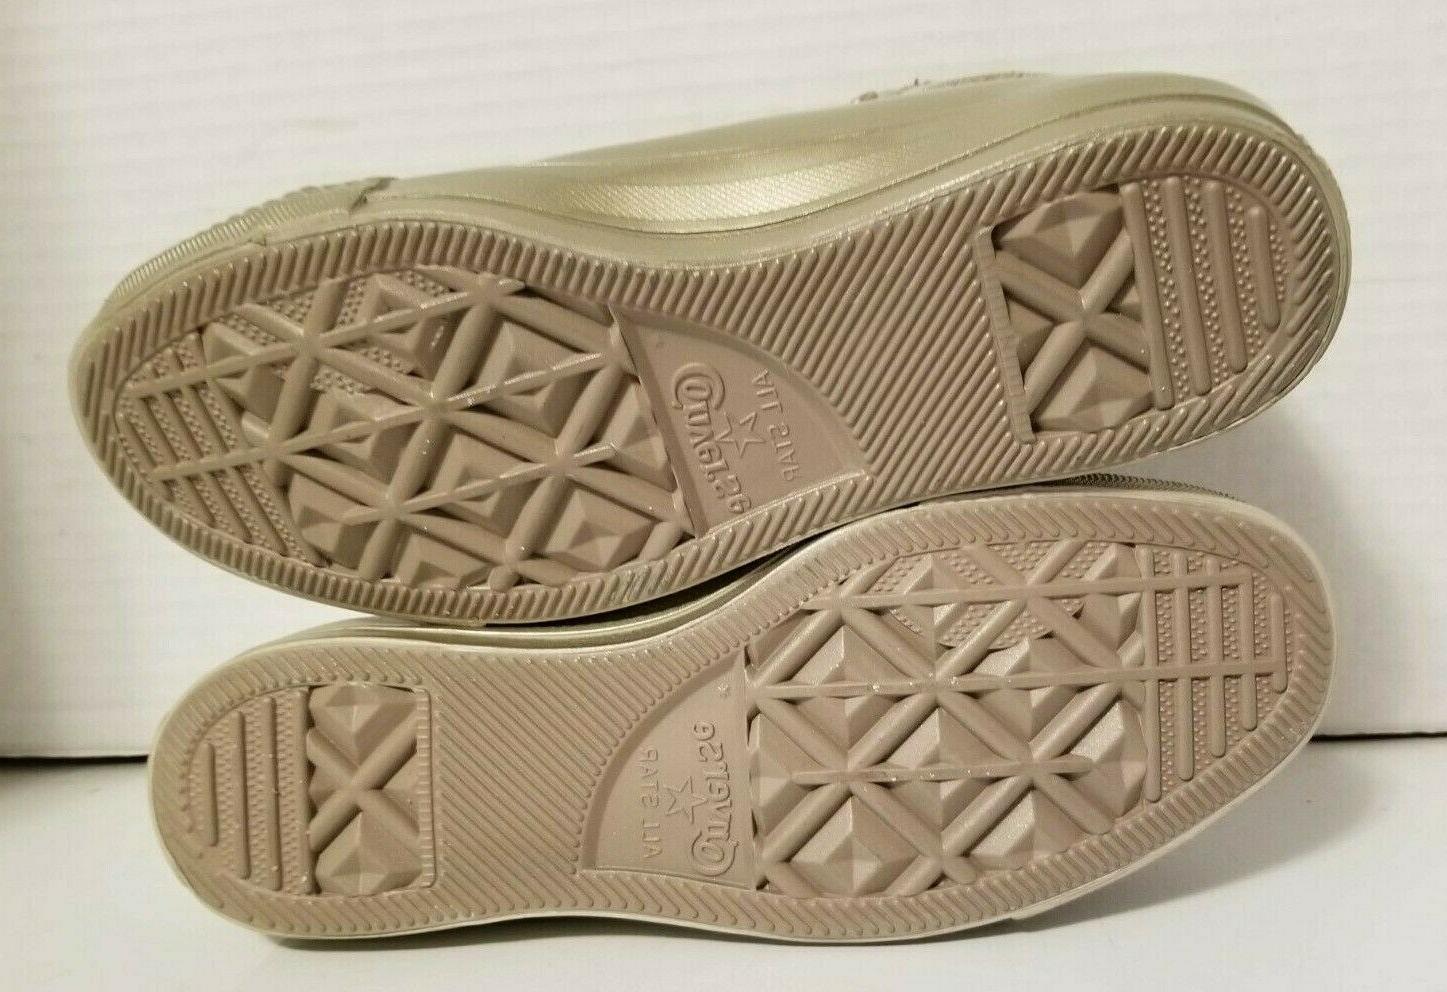 Converse Water Resistant Chucks High Tops Gold Dust Rain Boots Mens 6.5